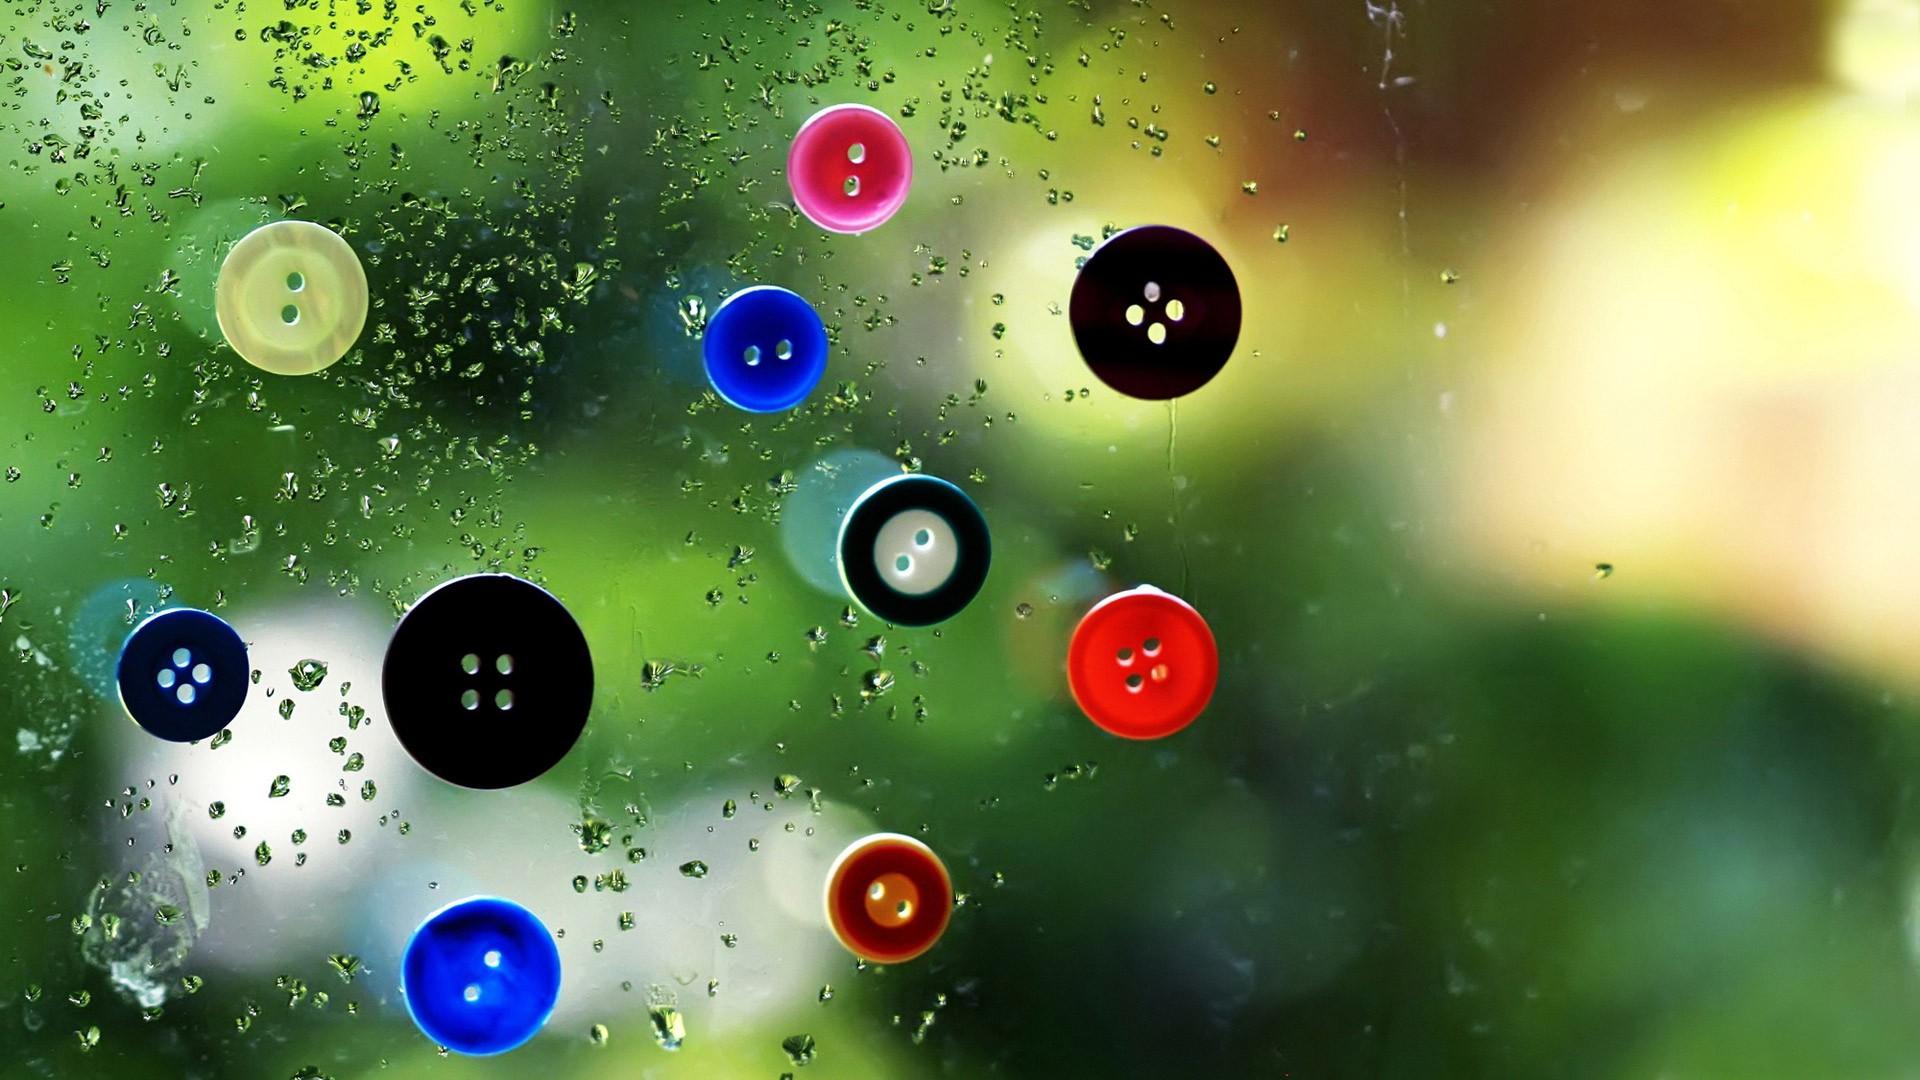 3D Buttons HD Wallpapers